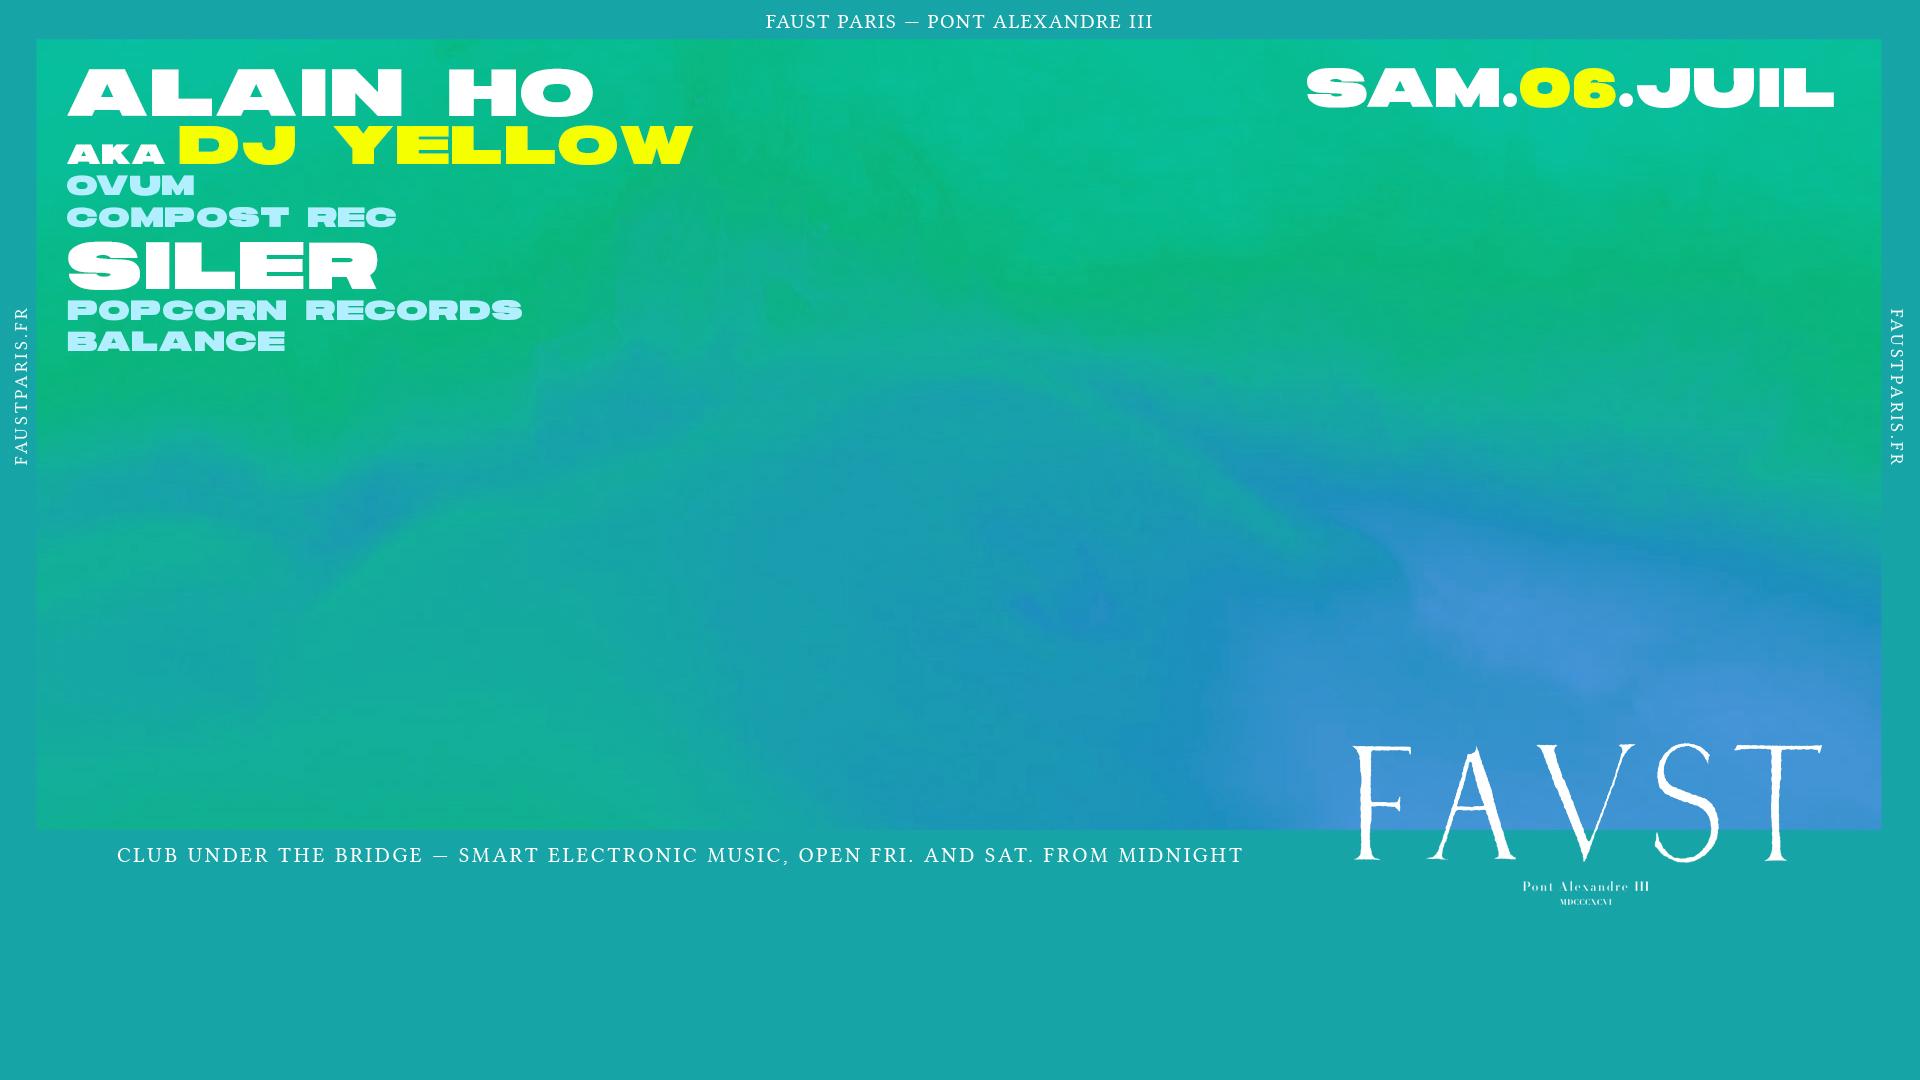 Faust - Alain Ho aka Dj Yellow & Siler